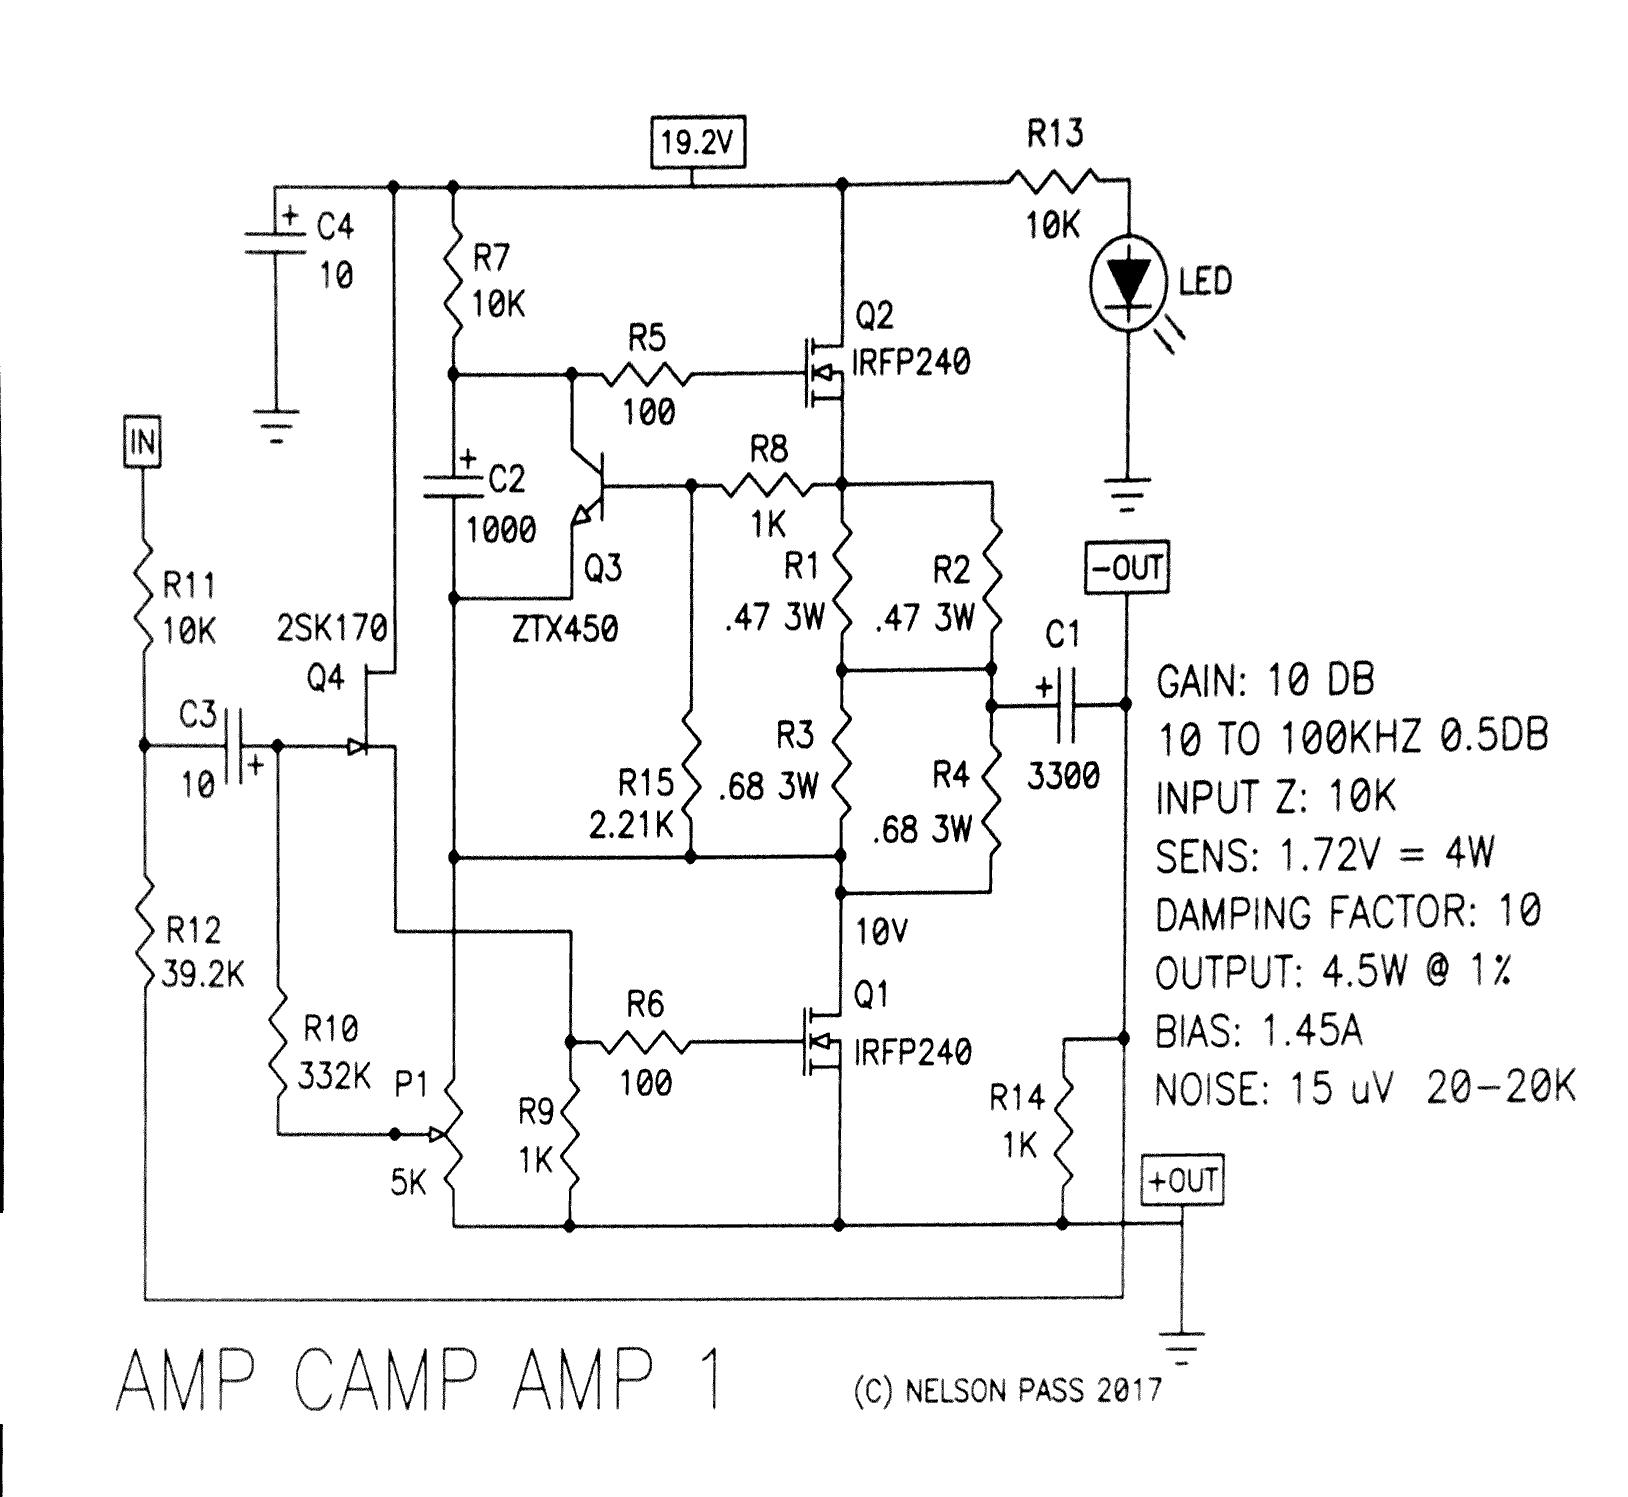 ACA V1.5 Illustrated Build Guide-aca1v1a-map-png